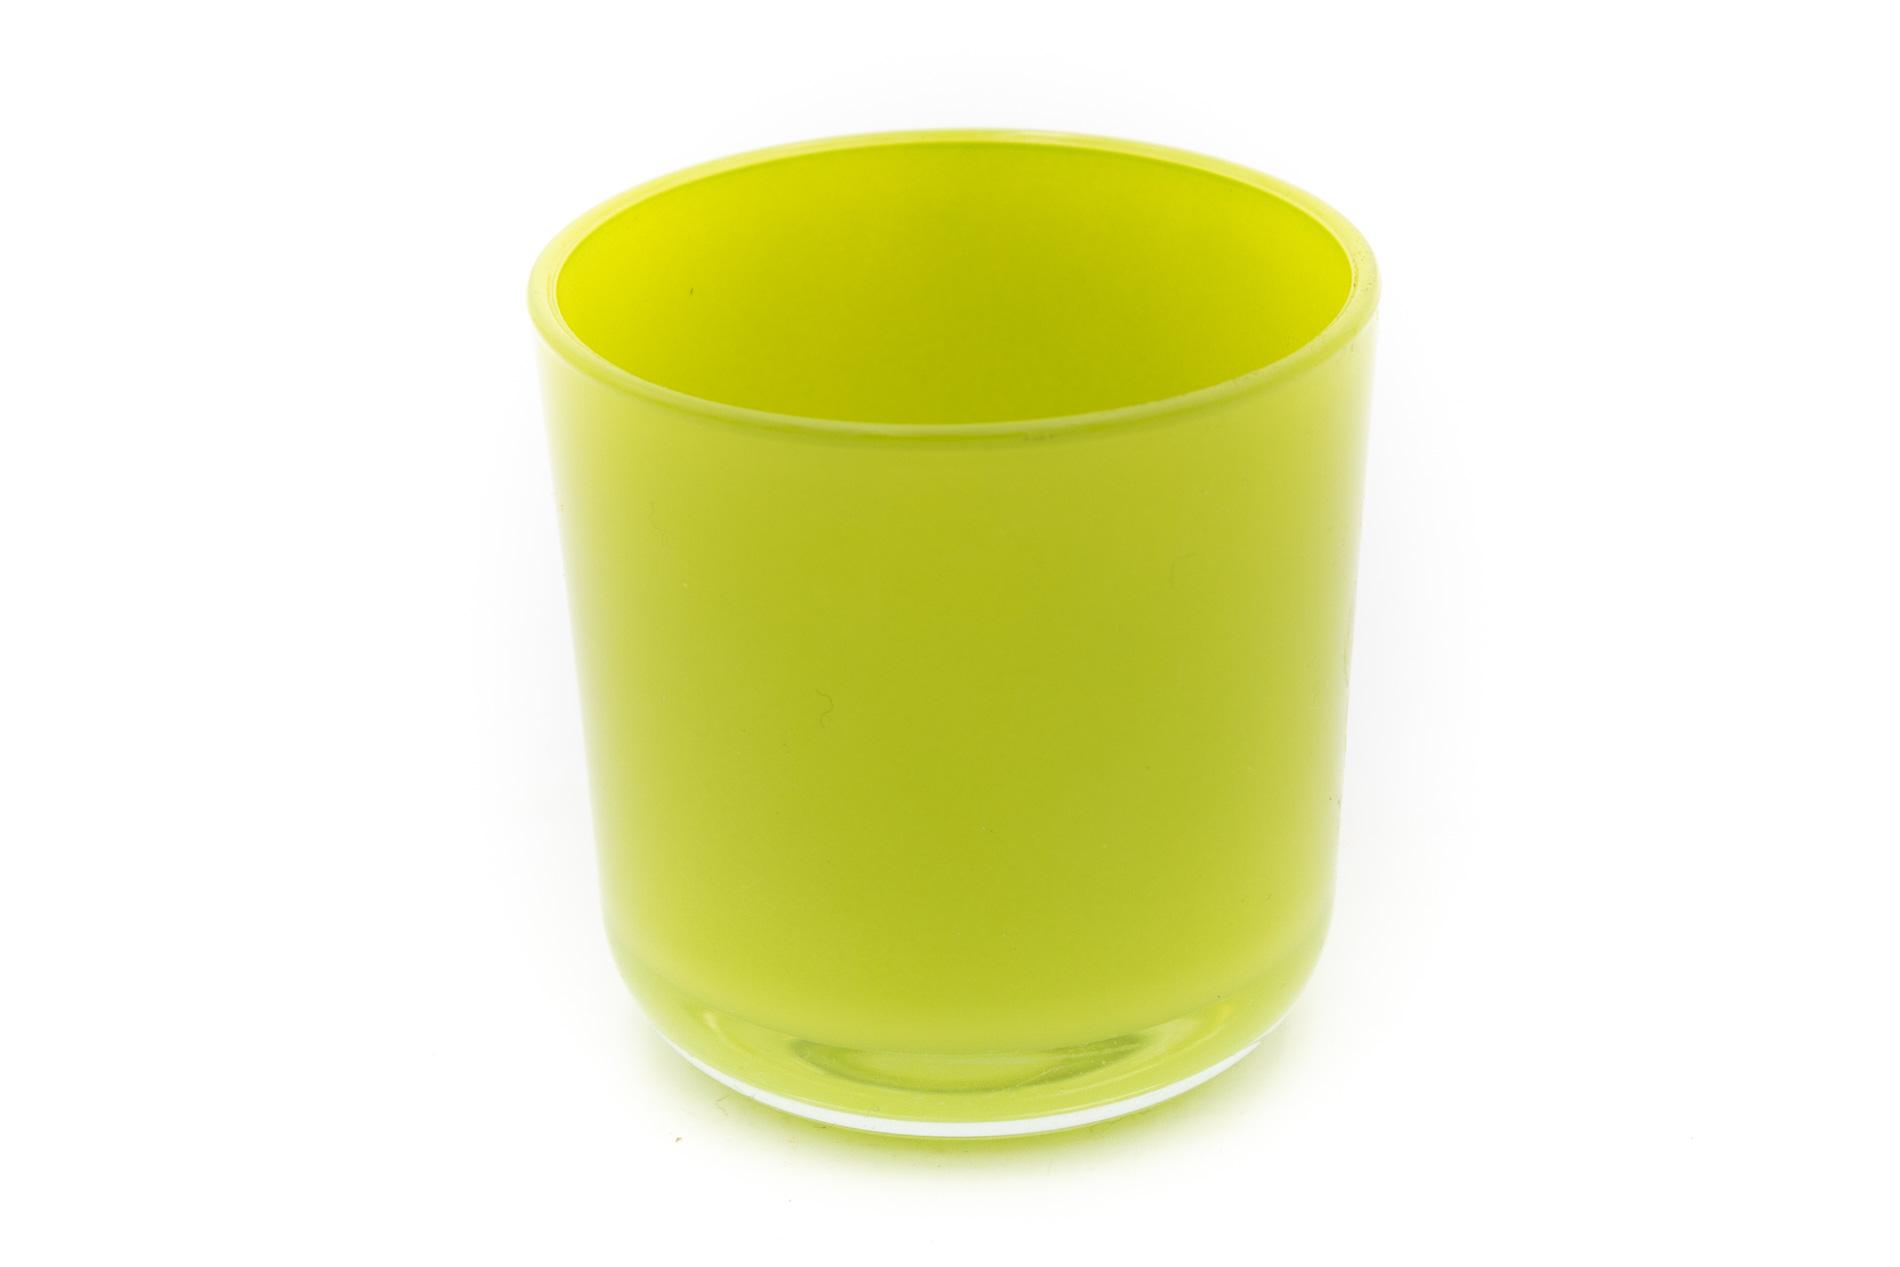 Blumentopf Davinci, Glas grün , H 7,8 D7,8